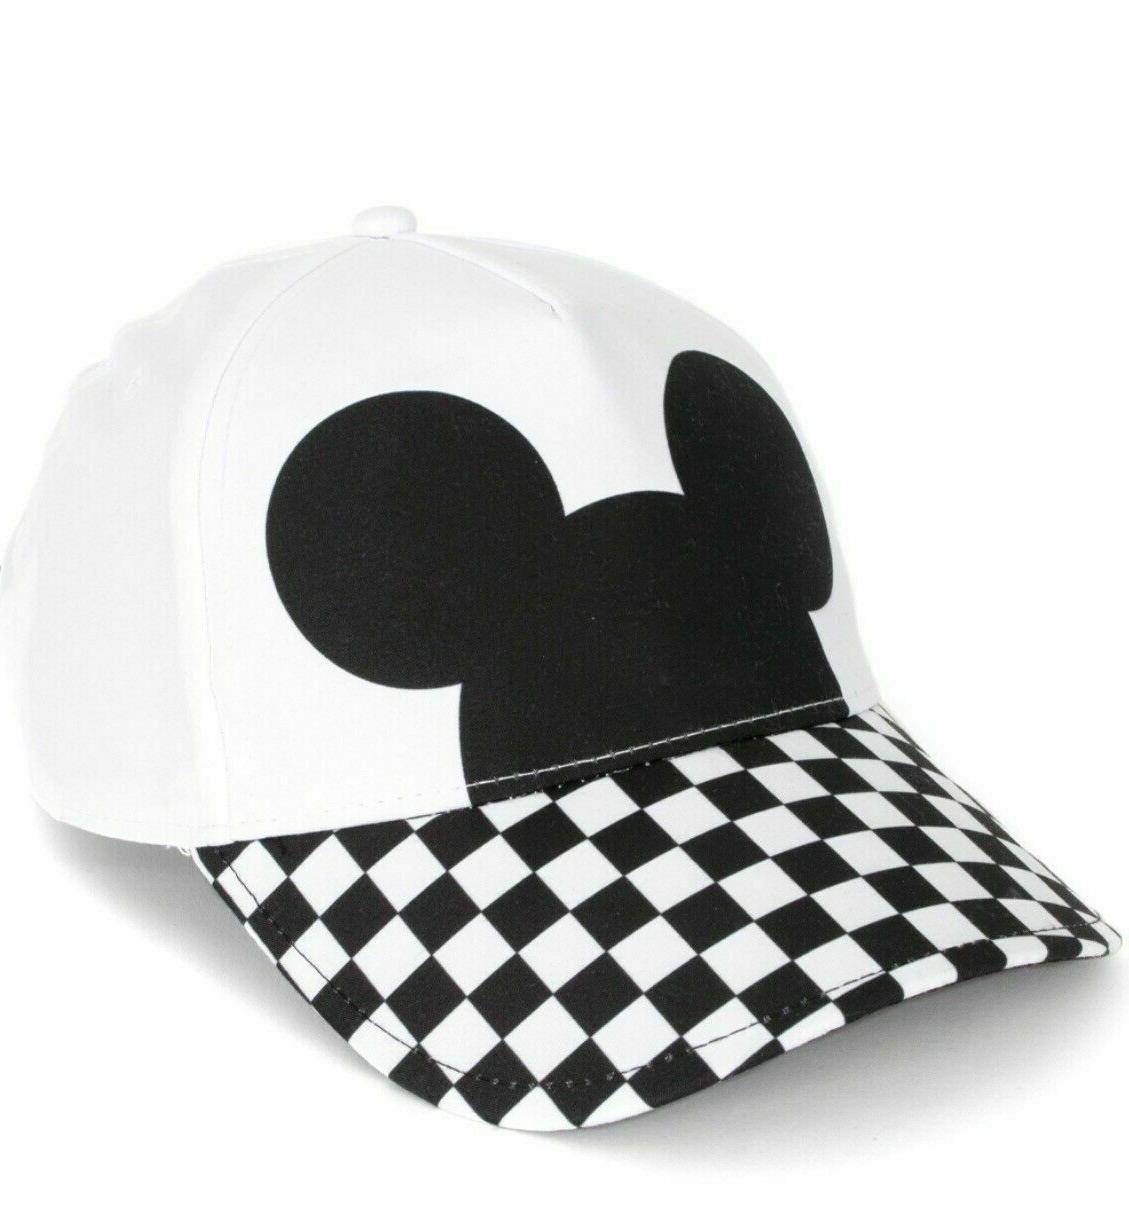 NWT VANS DISNEY Limited CHECKERBOARD MICKEY HAT Strapback BL